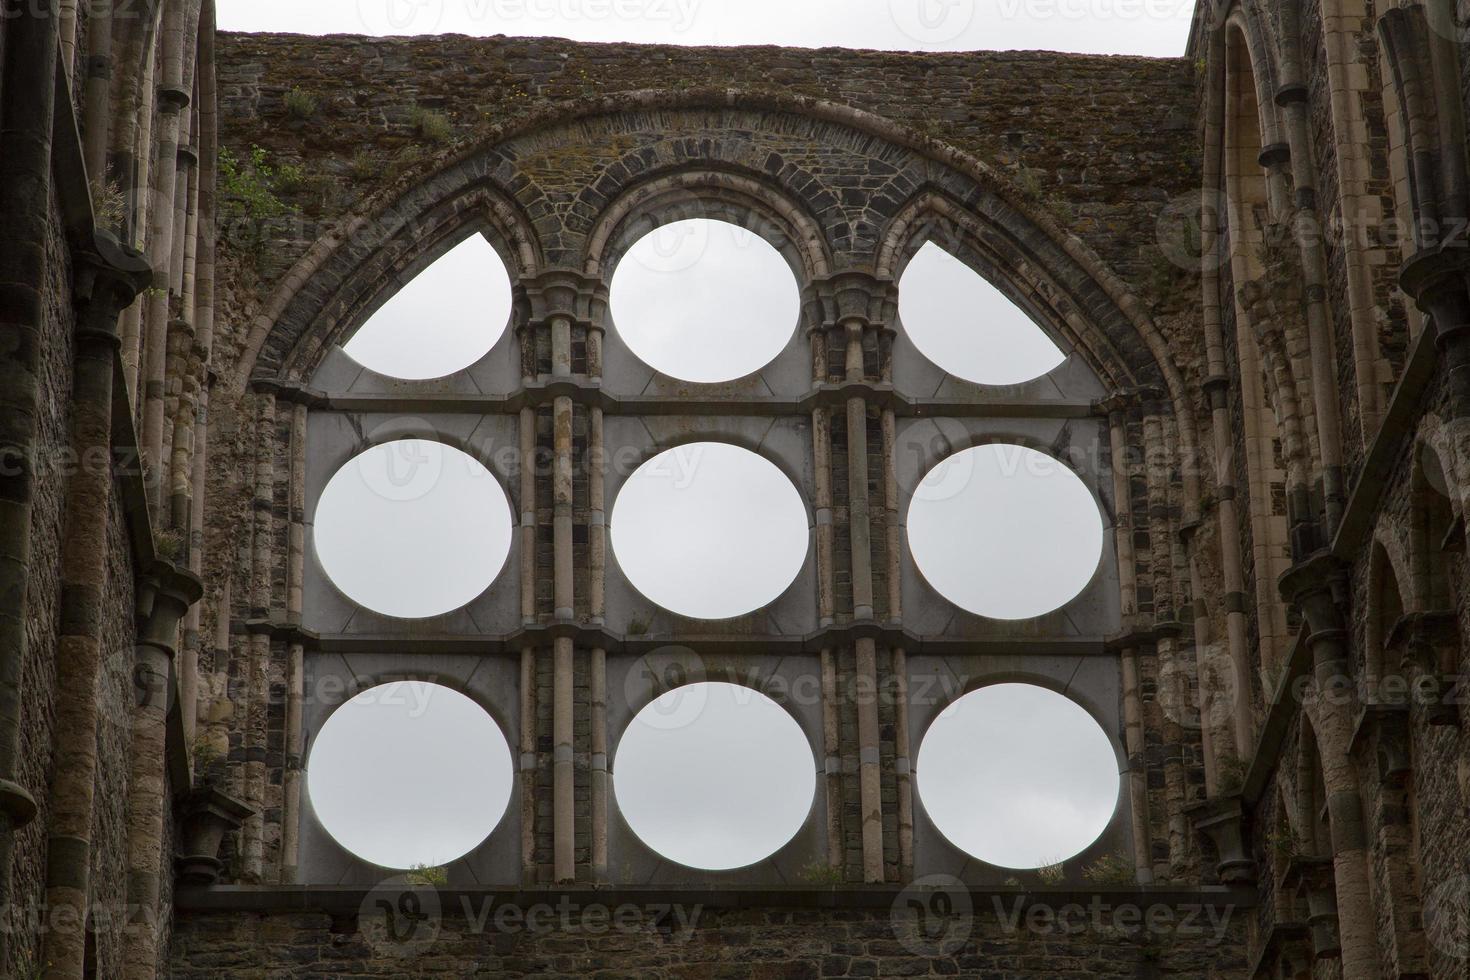 villers-la-ville abbaye foto